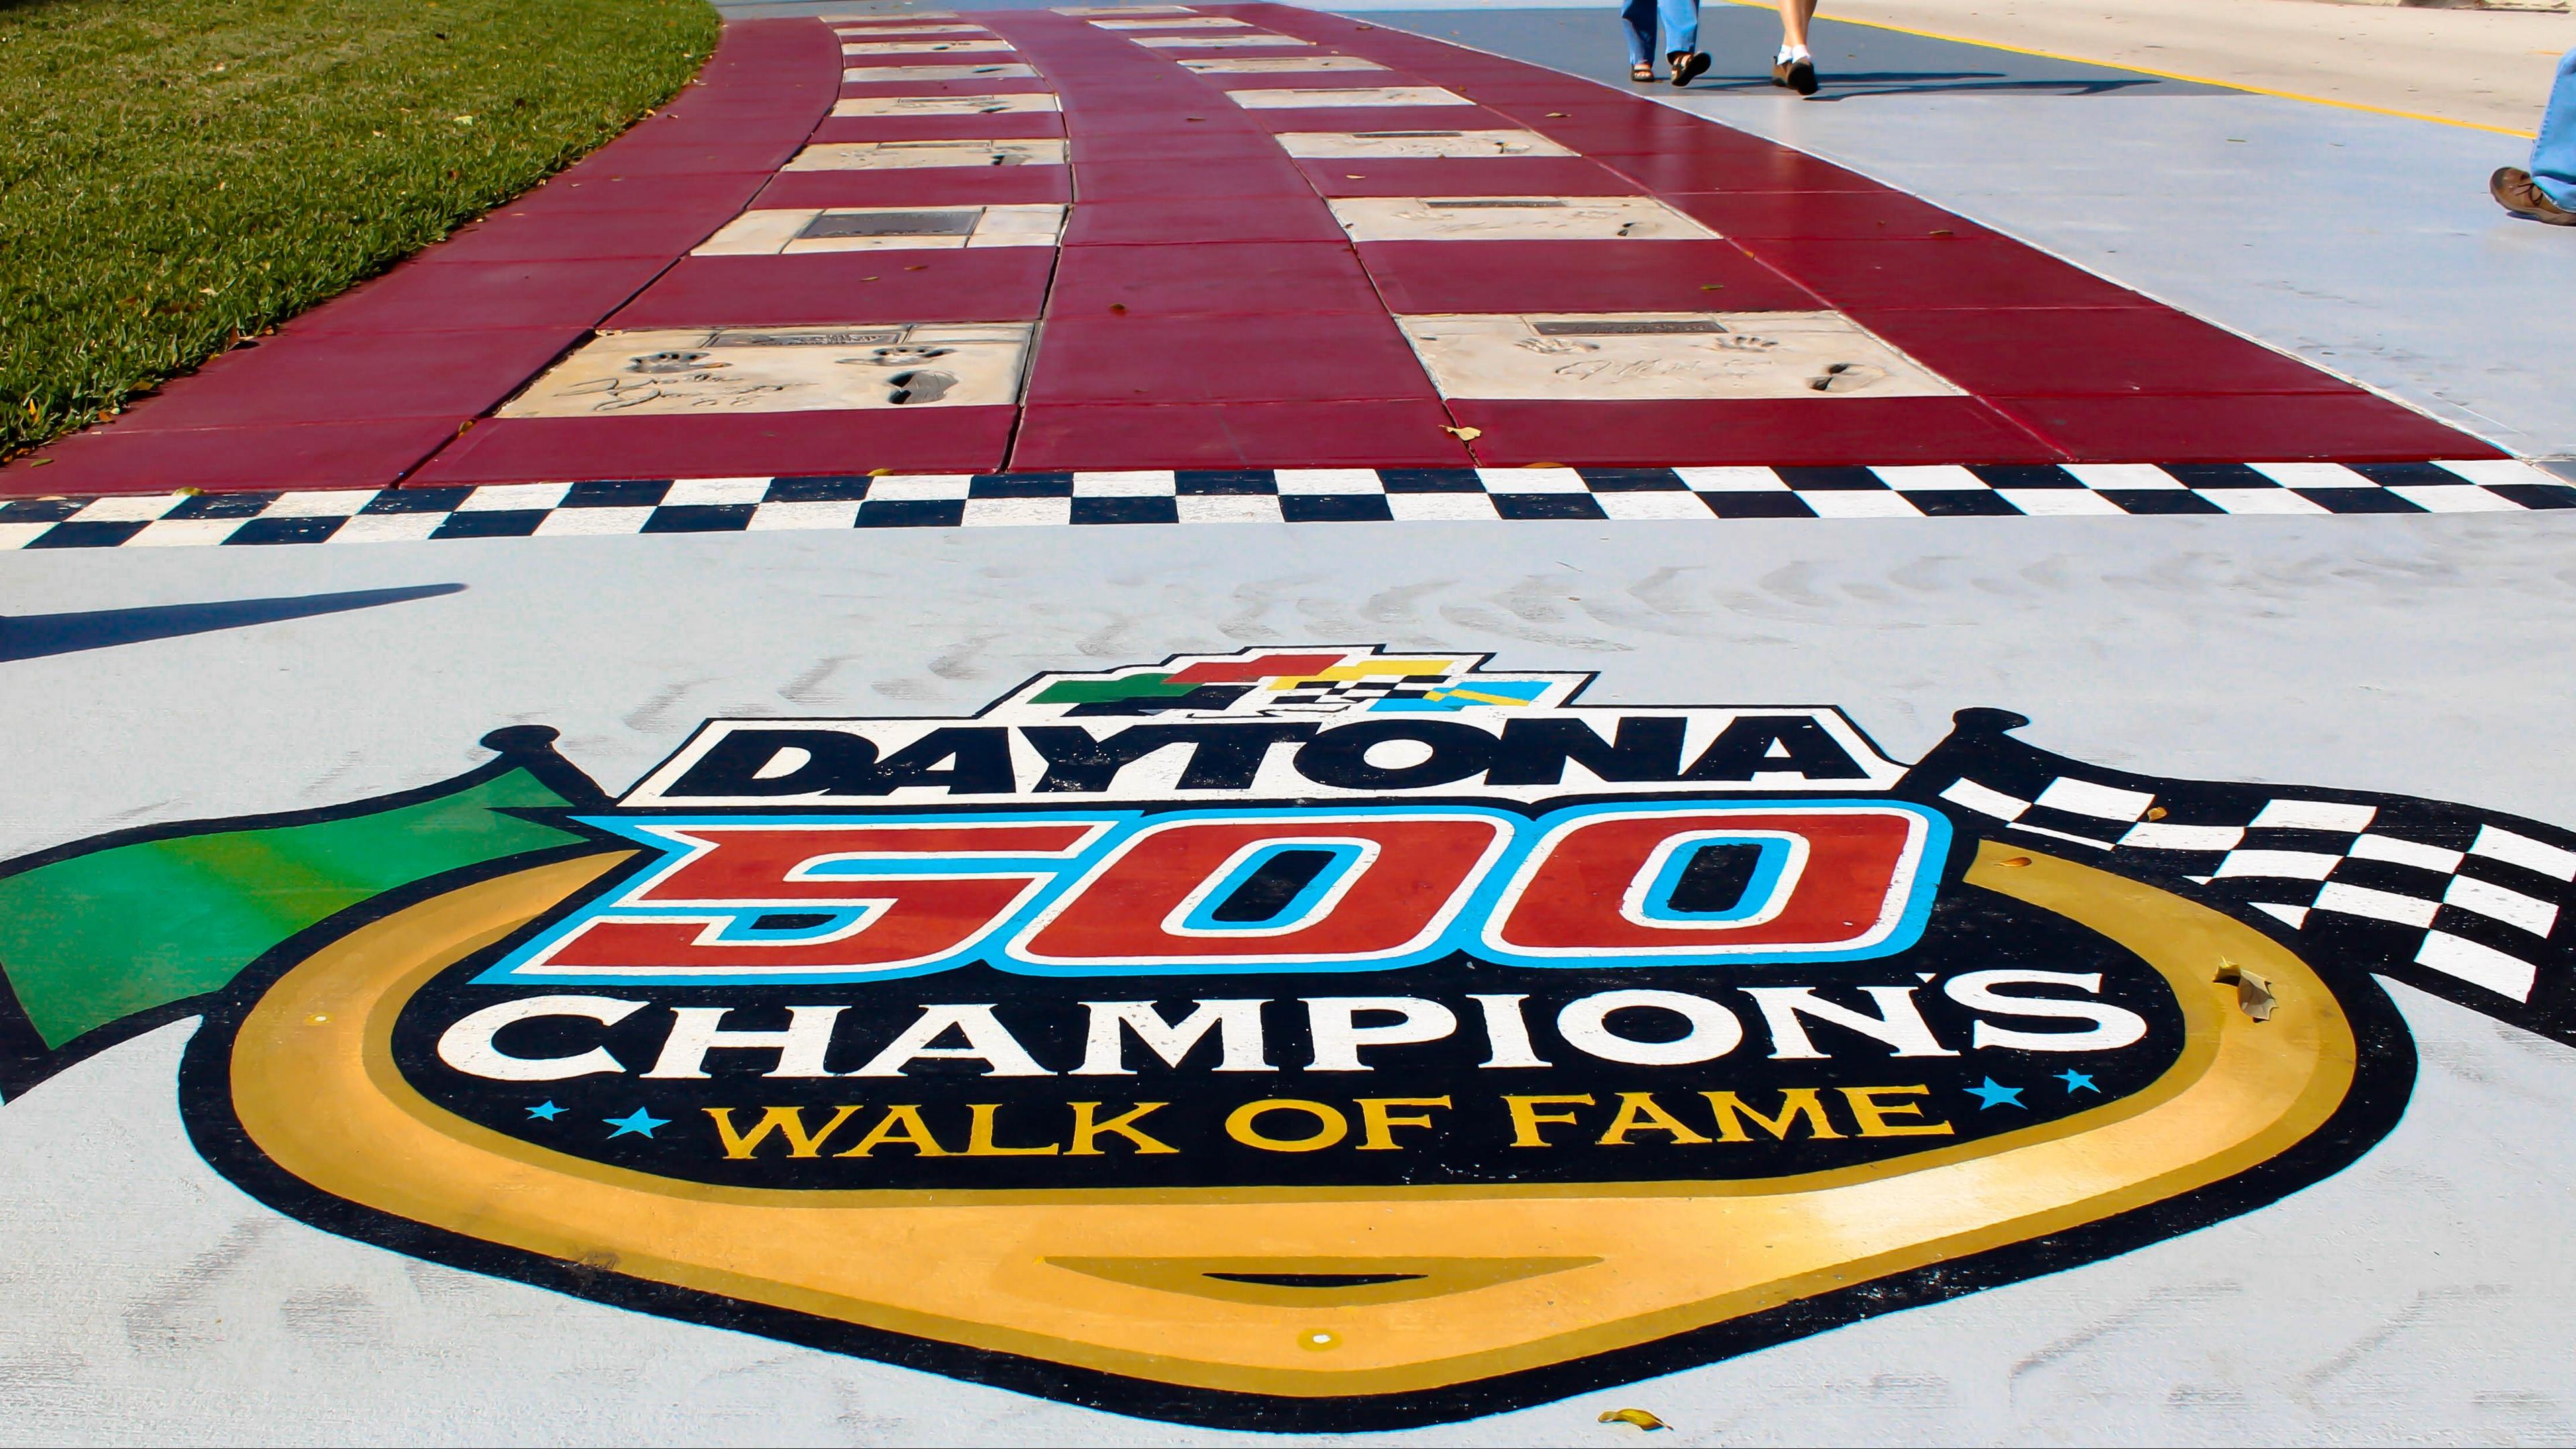 daytona 500 daytona international speedway 2015 racing daytona beach florida 4k 1540063271 - daytona 500, daytona international speedway, 2015, racing, daytona beach, florida 4k - daytona international speedway, daytona 500, 2015